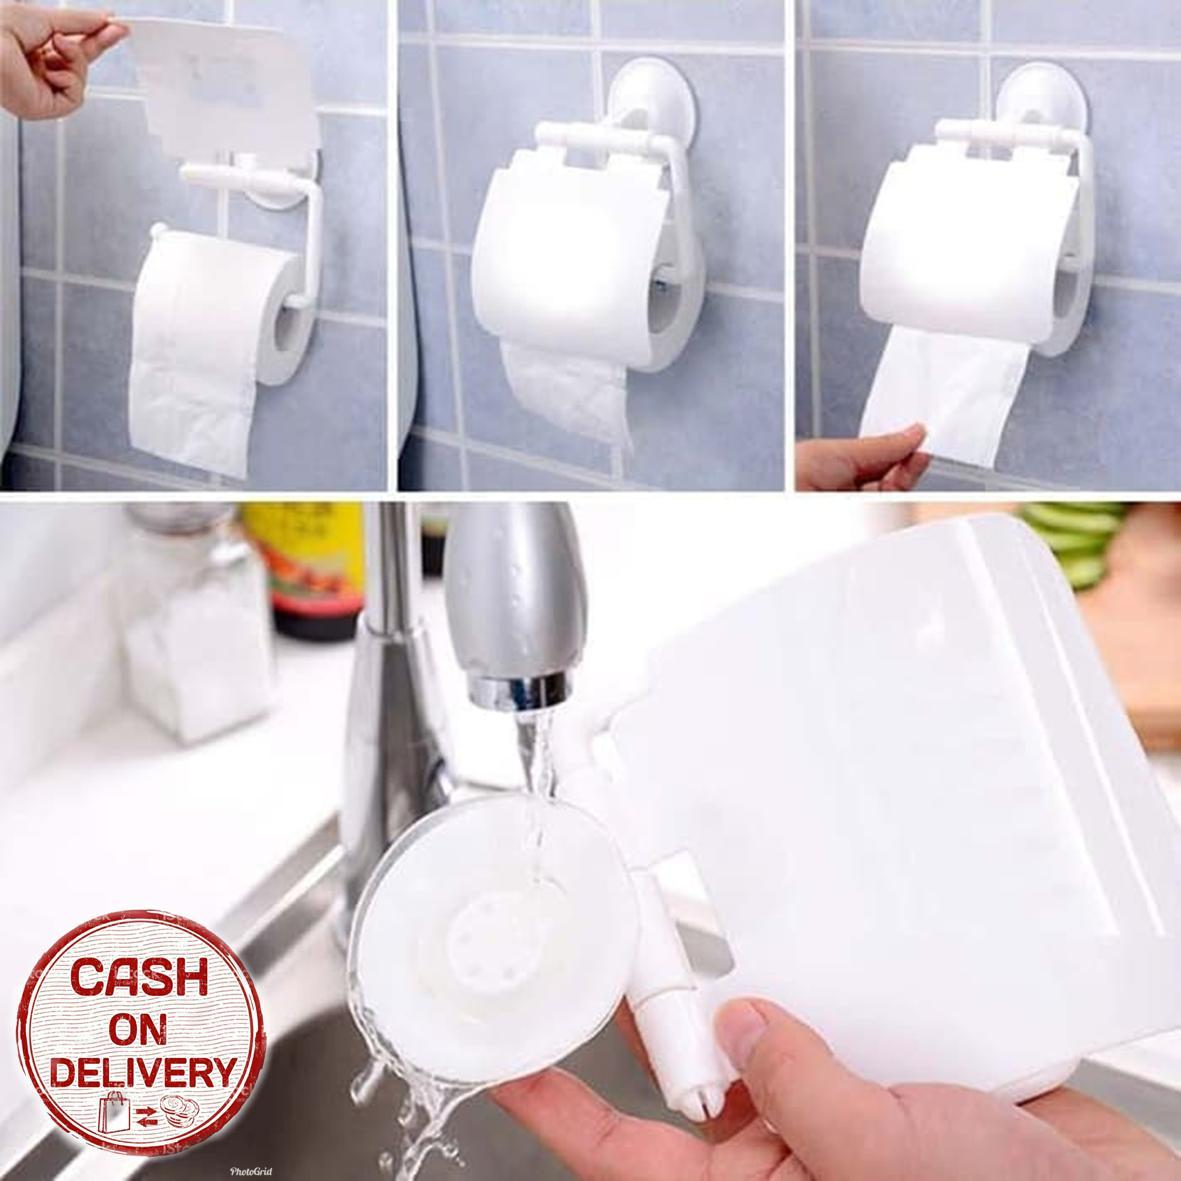 Kado Unik-- Tempat Tissue Gulung Vacum / Toilet Roll Holder With Suction Vacum Tanpa Paku / Wadah Storage Kamar Mandi / Tempat Tissue Gulung Rol / Tempat Tissue Gulung Rol Murah